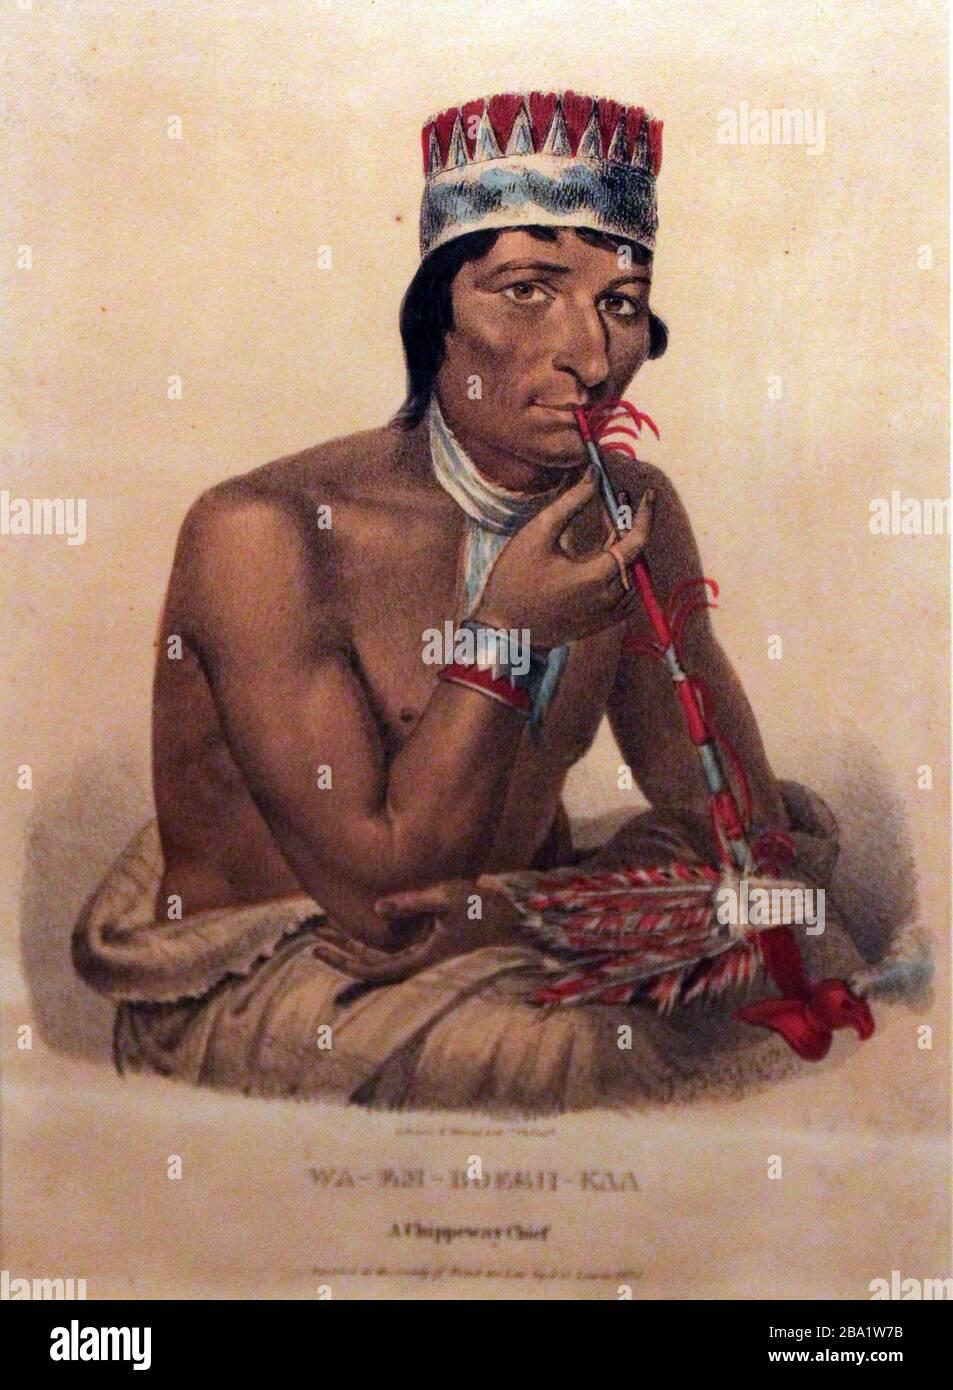 """English: Waemboeshkaa, Chippeway Chief, 1825 Deutsch: Waemboeshkaa, Häuptling der Chippeway, 1825; 1825date QS:P,+1825-00-00T00:00:00Z/9; "" Stock Photo"